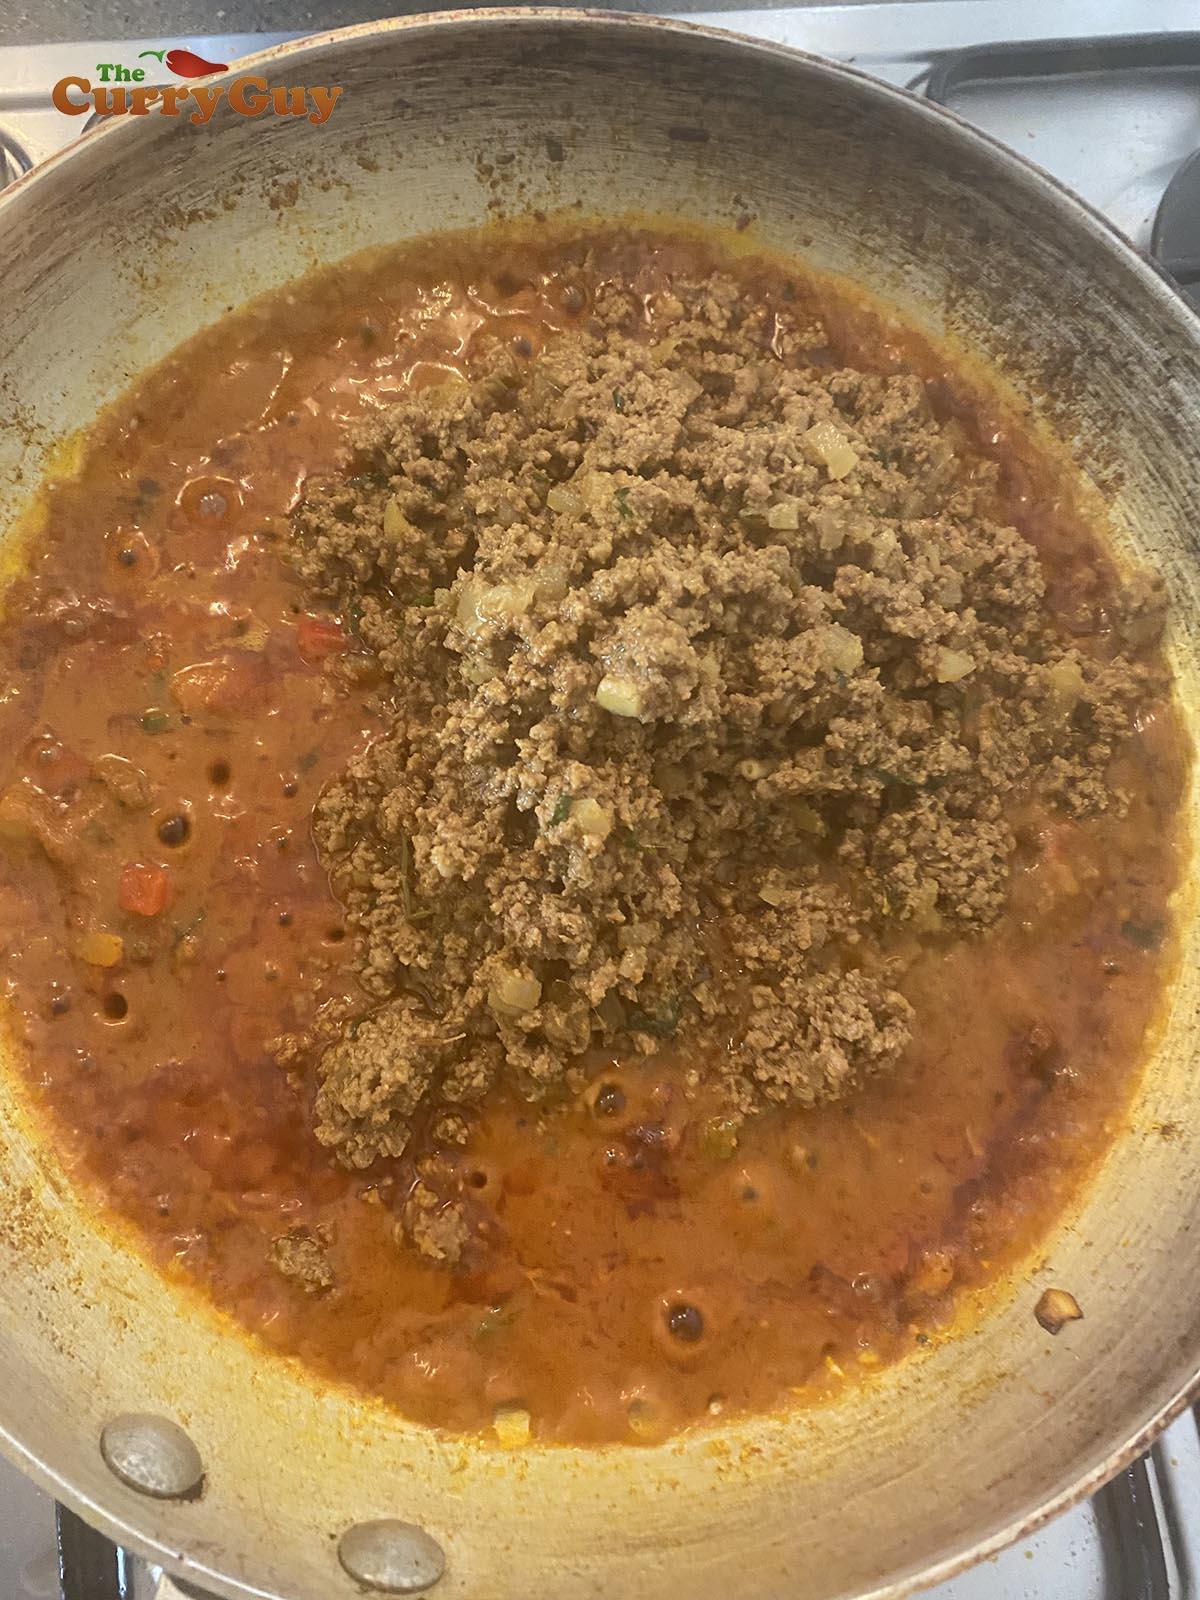 Adding pre-cooked keema